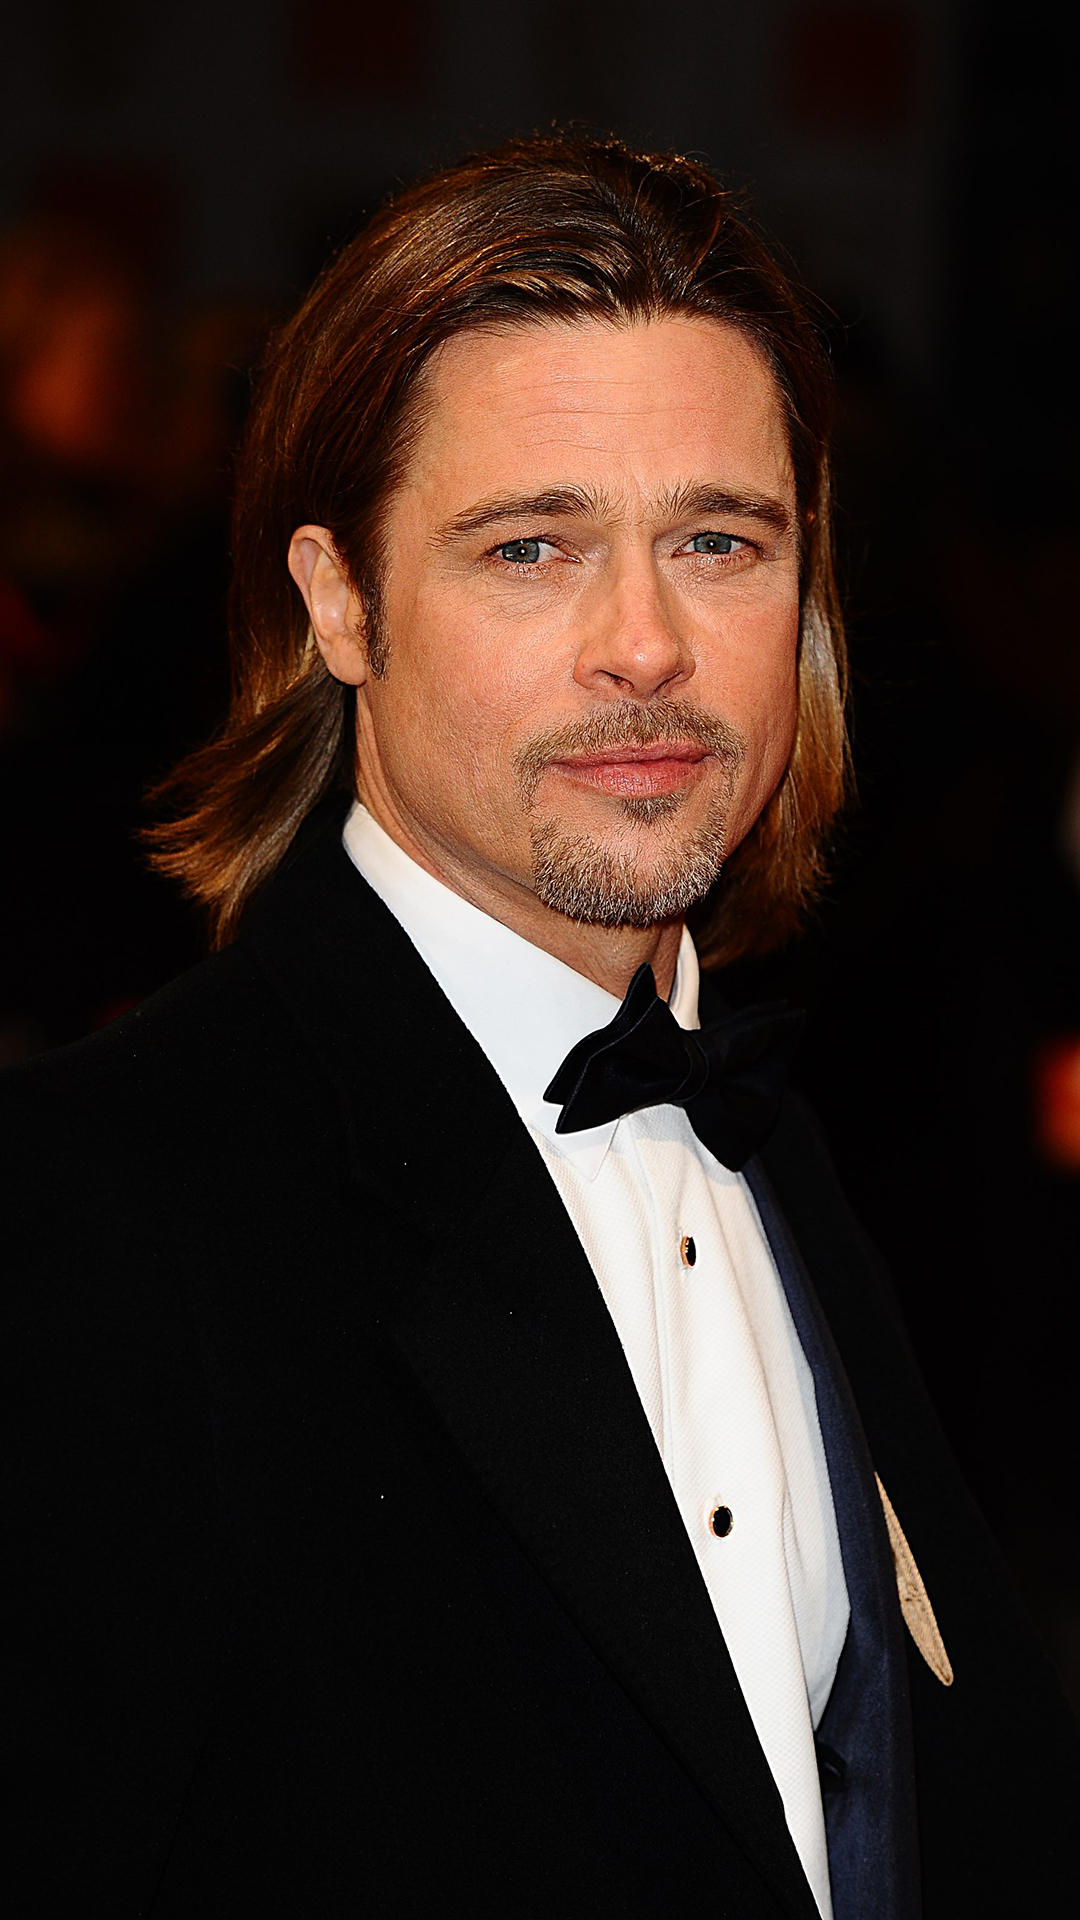 Brad Pitt htc one wallpaper